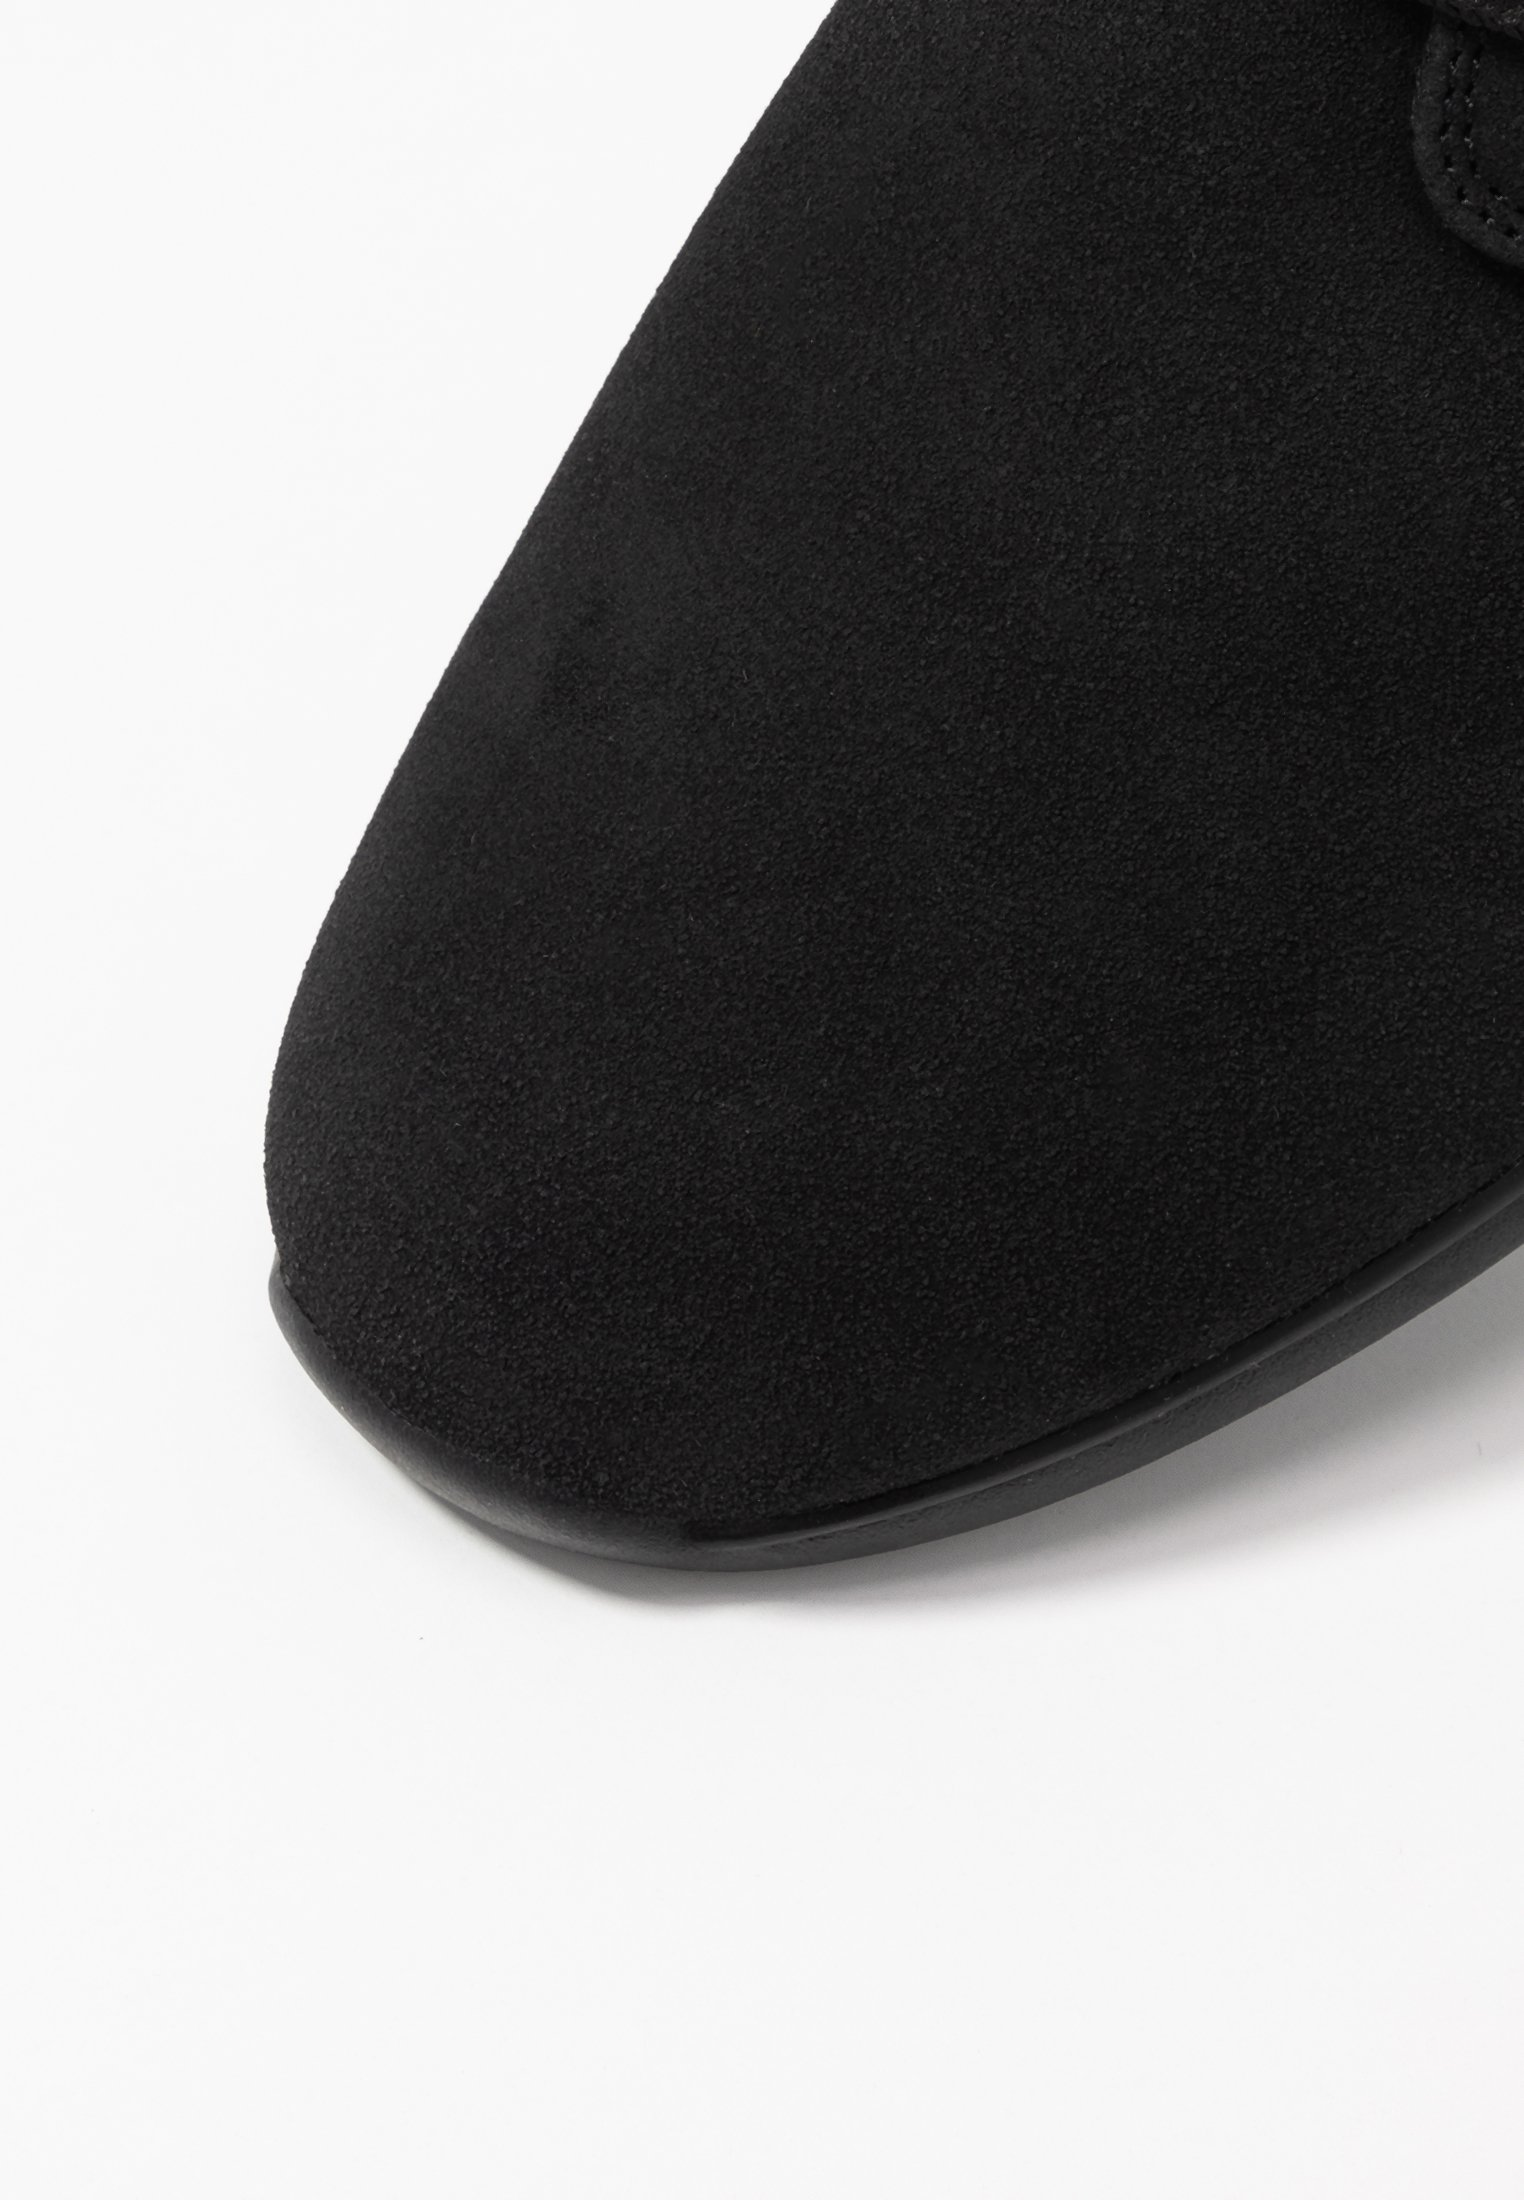 Pier One Stringate Sportive - Black Scarpe Scontate